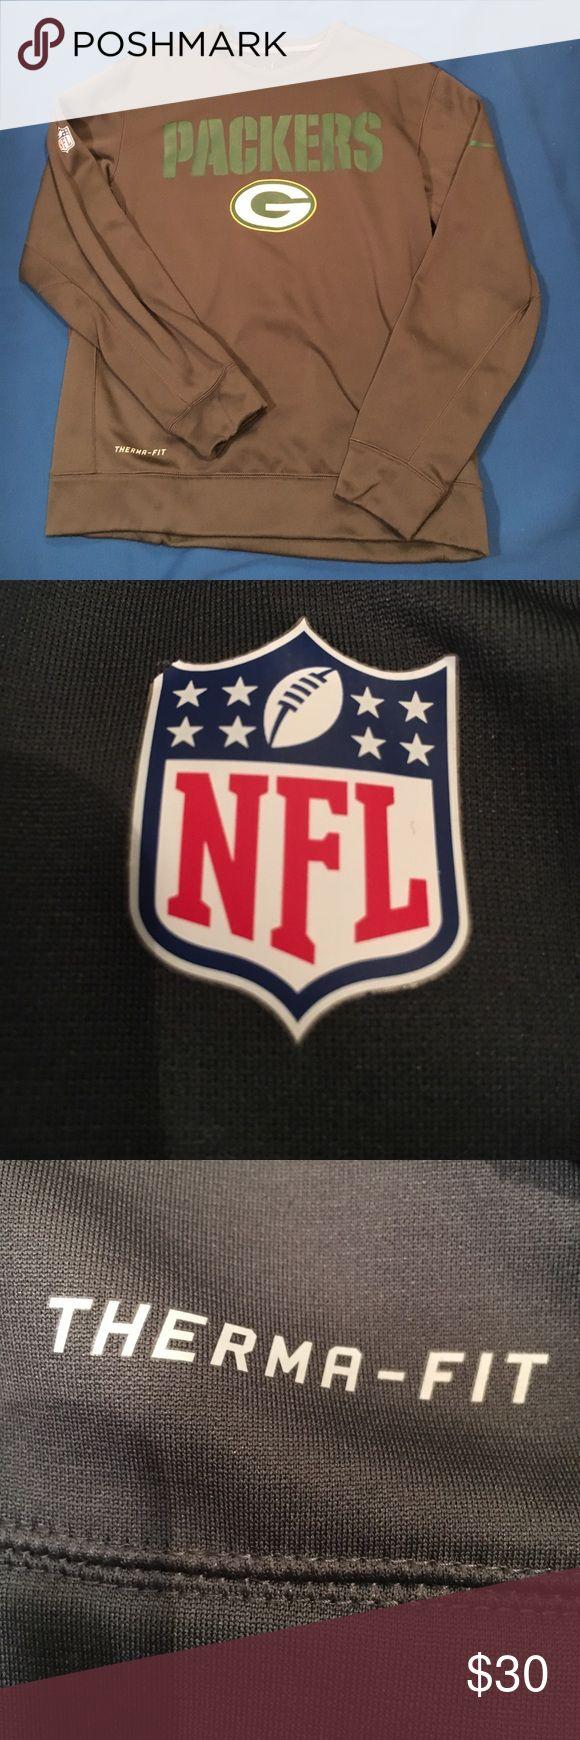 Packers NFL Sweatshirt Therma- Fit Excellent Condition... Packers NFL Nike Sweatshirt. Grey and Green. It is a Therma- Fit Sweatshirt NFL Shirts Sweatshirts & Hoodies